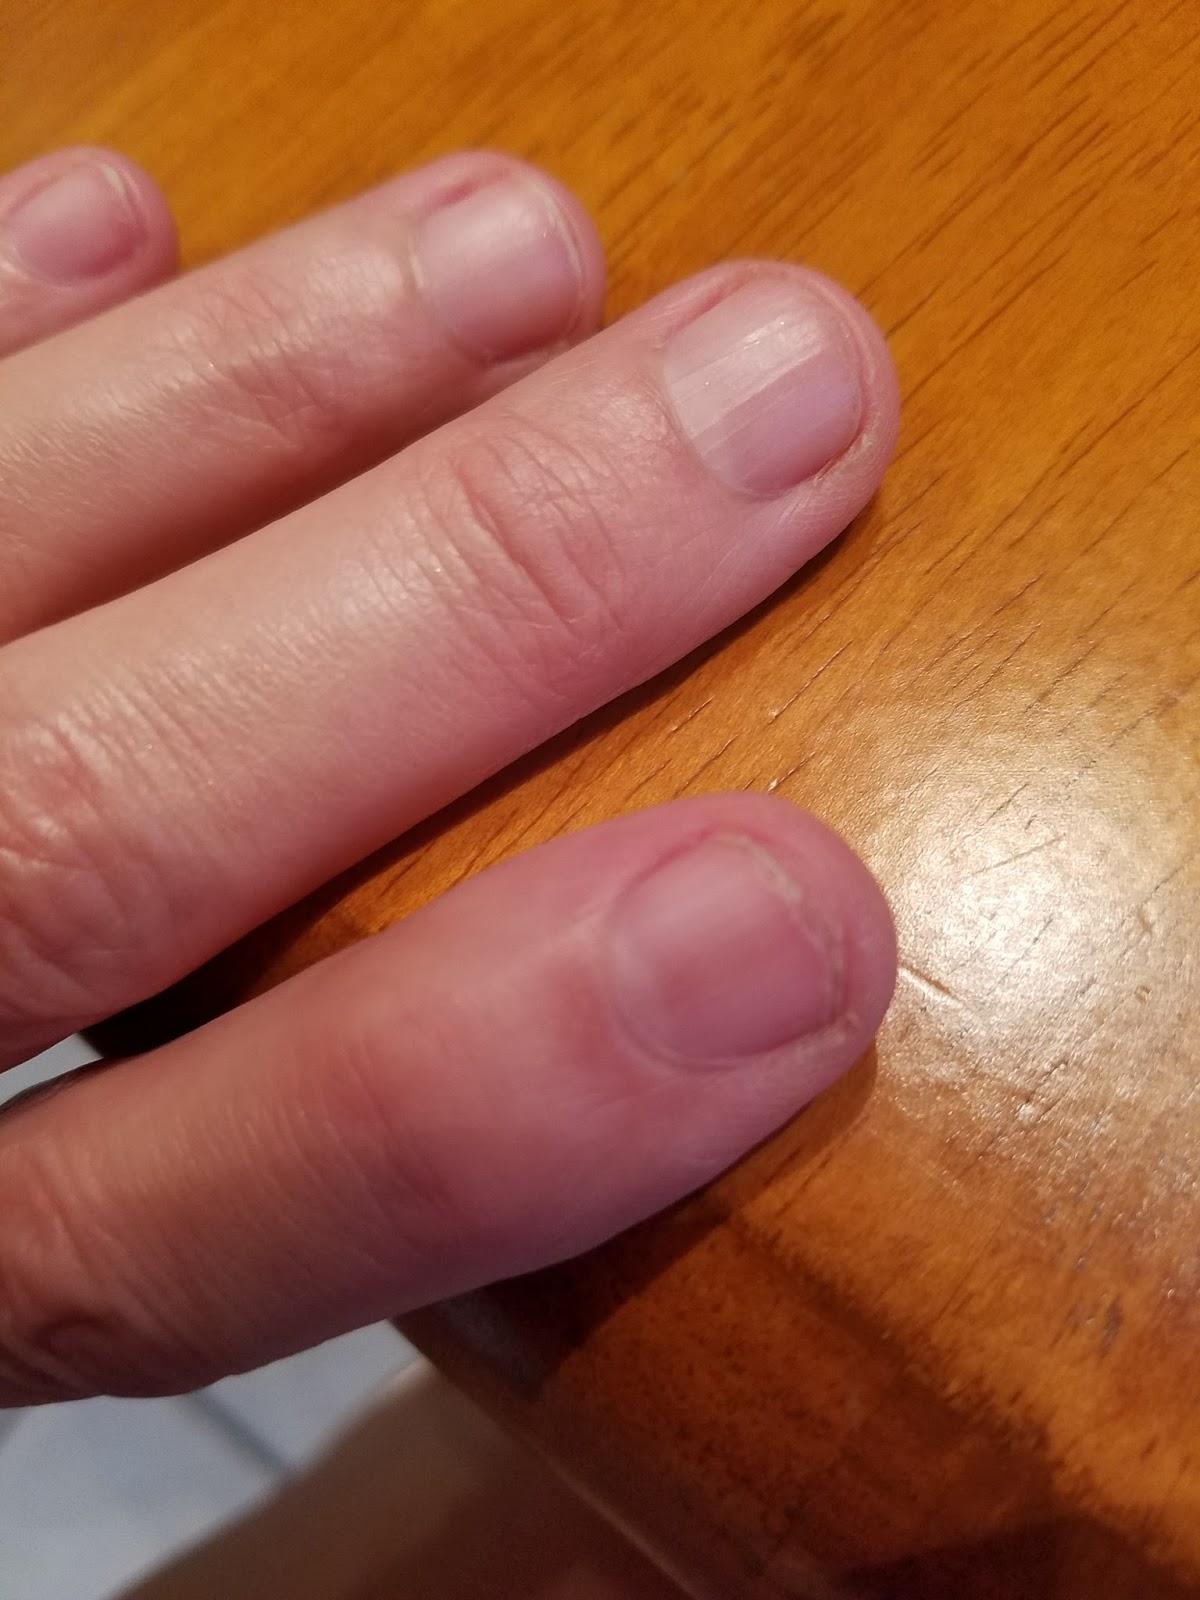 BLOGSGOTHEART: Do Your Fingernails Peel And Crack?